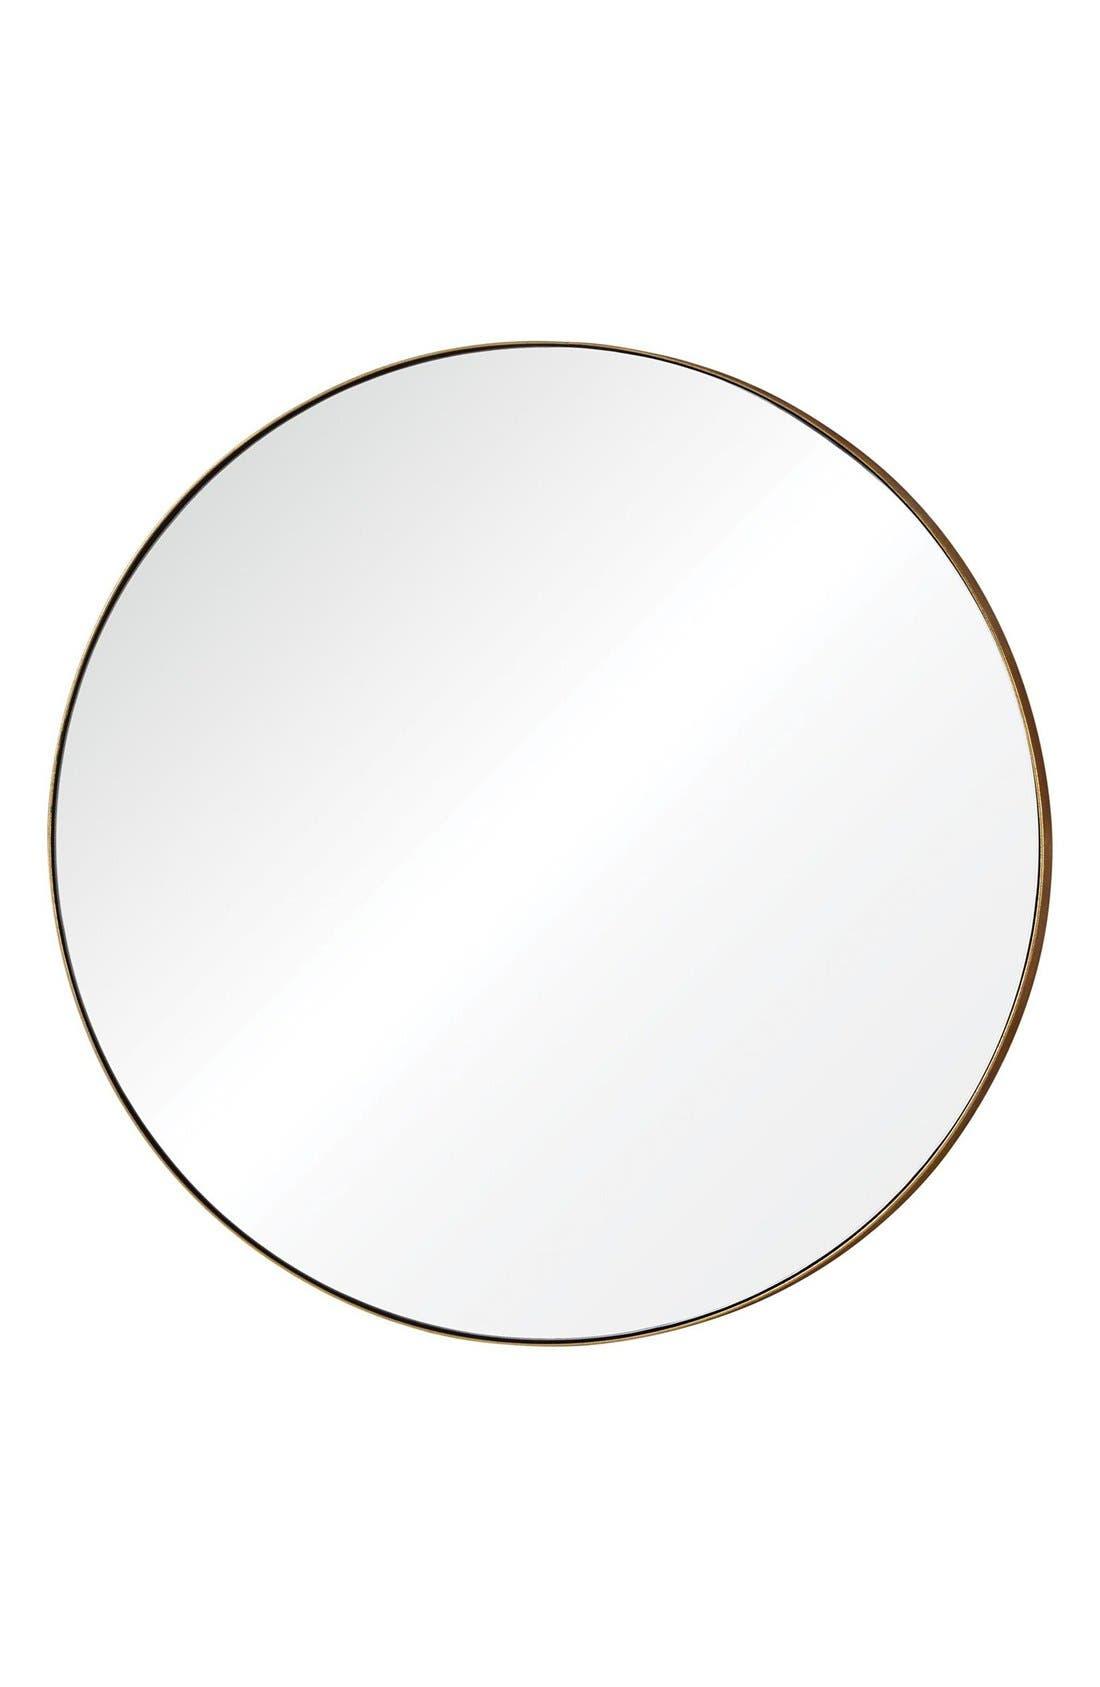 'Oryx' Mirror,                         Main,                         color, Gold